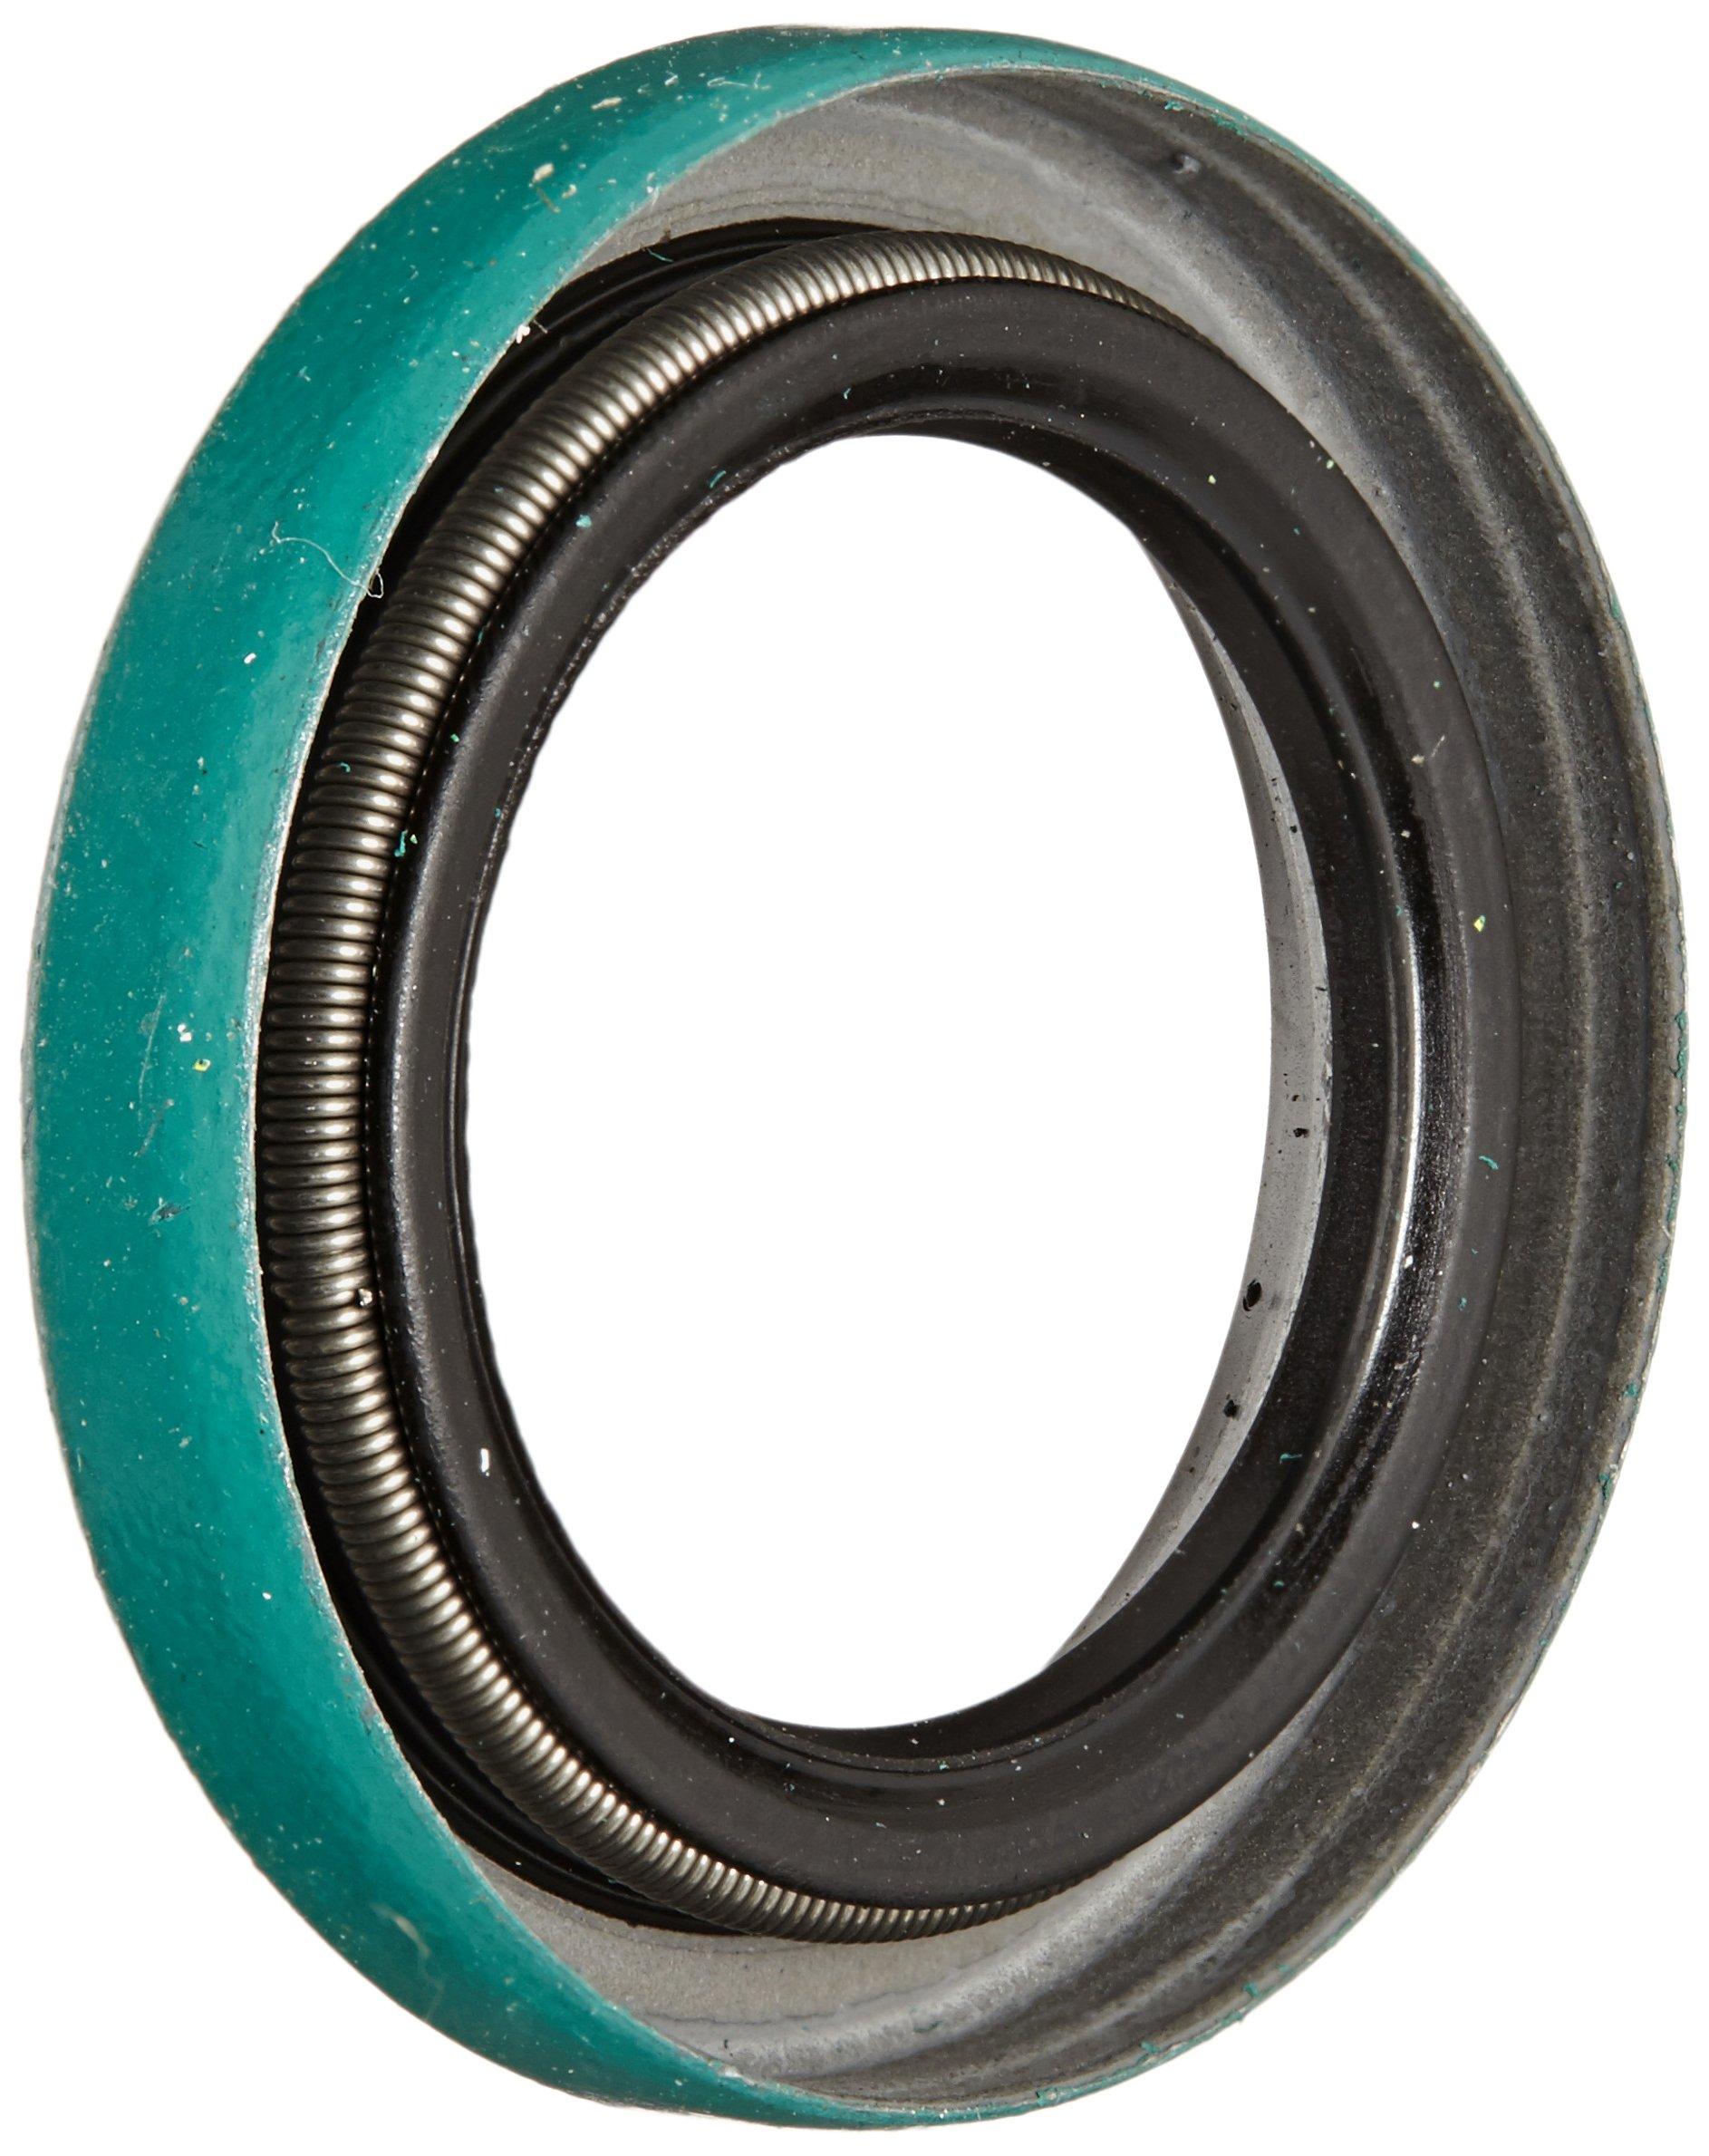 1.624 Bore Diameter 0.875 Shaft Diameter Inch SKF 8796 LDS /& Small Bore Seal CRW1 Style R Lip Code 0.25 Width